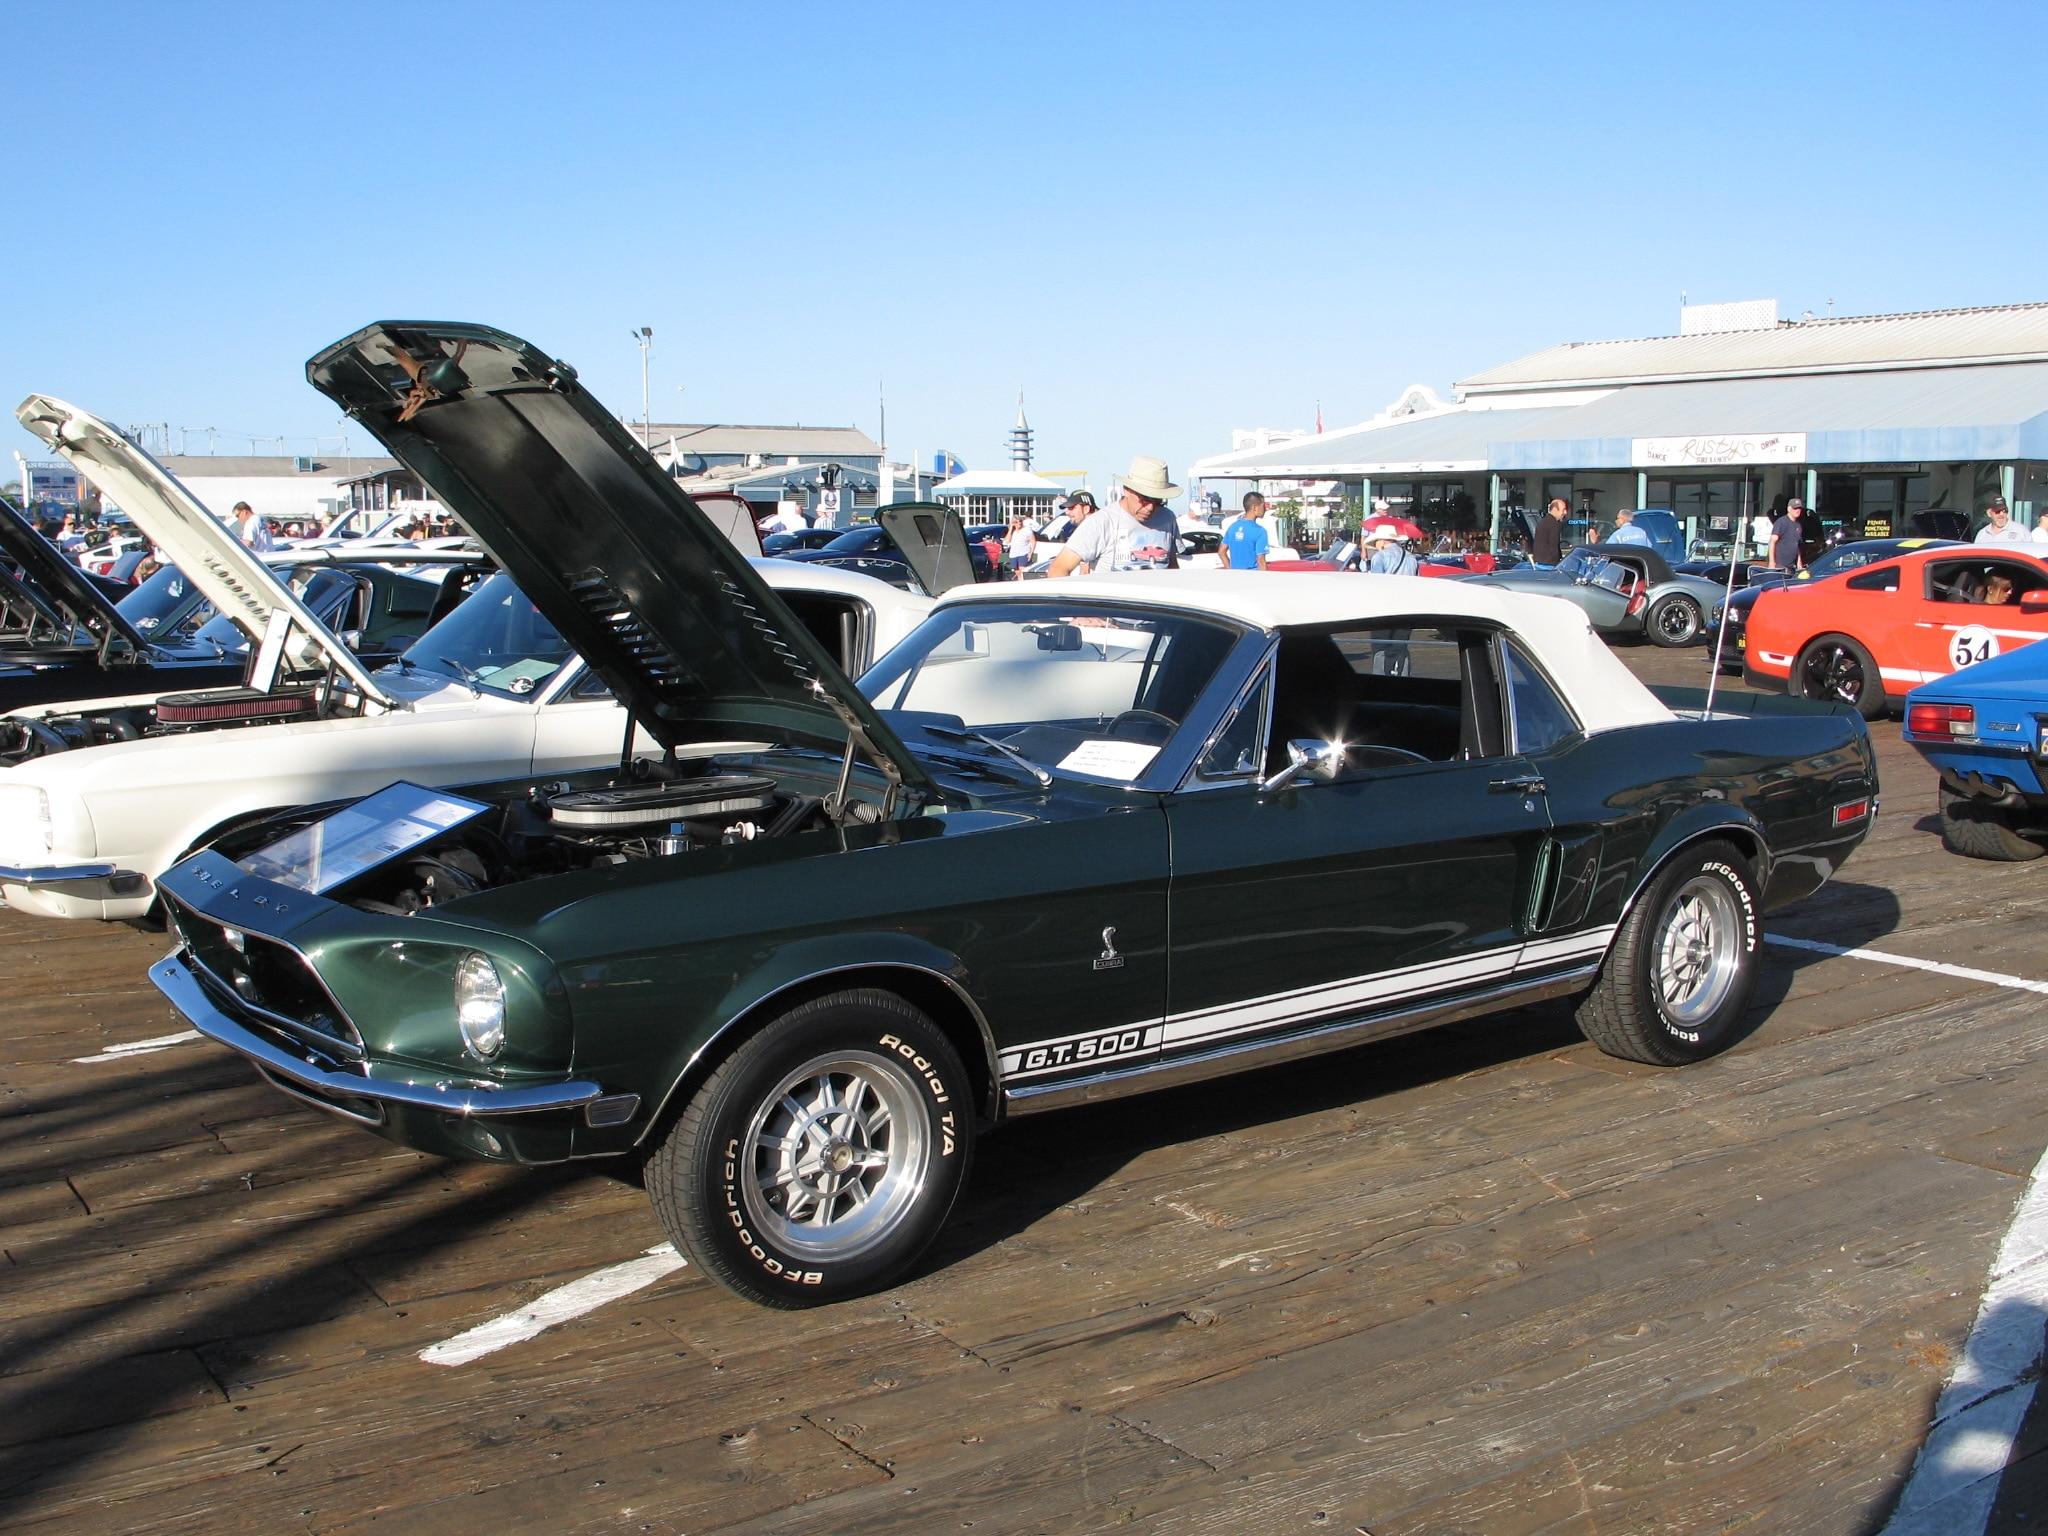 2016 Shelbys On Santa Monica Pier Lasaac 07